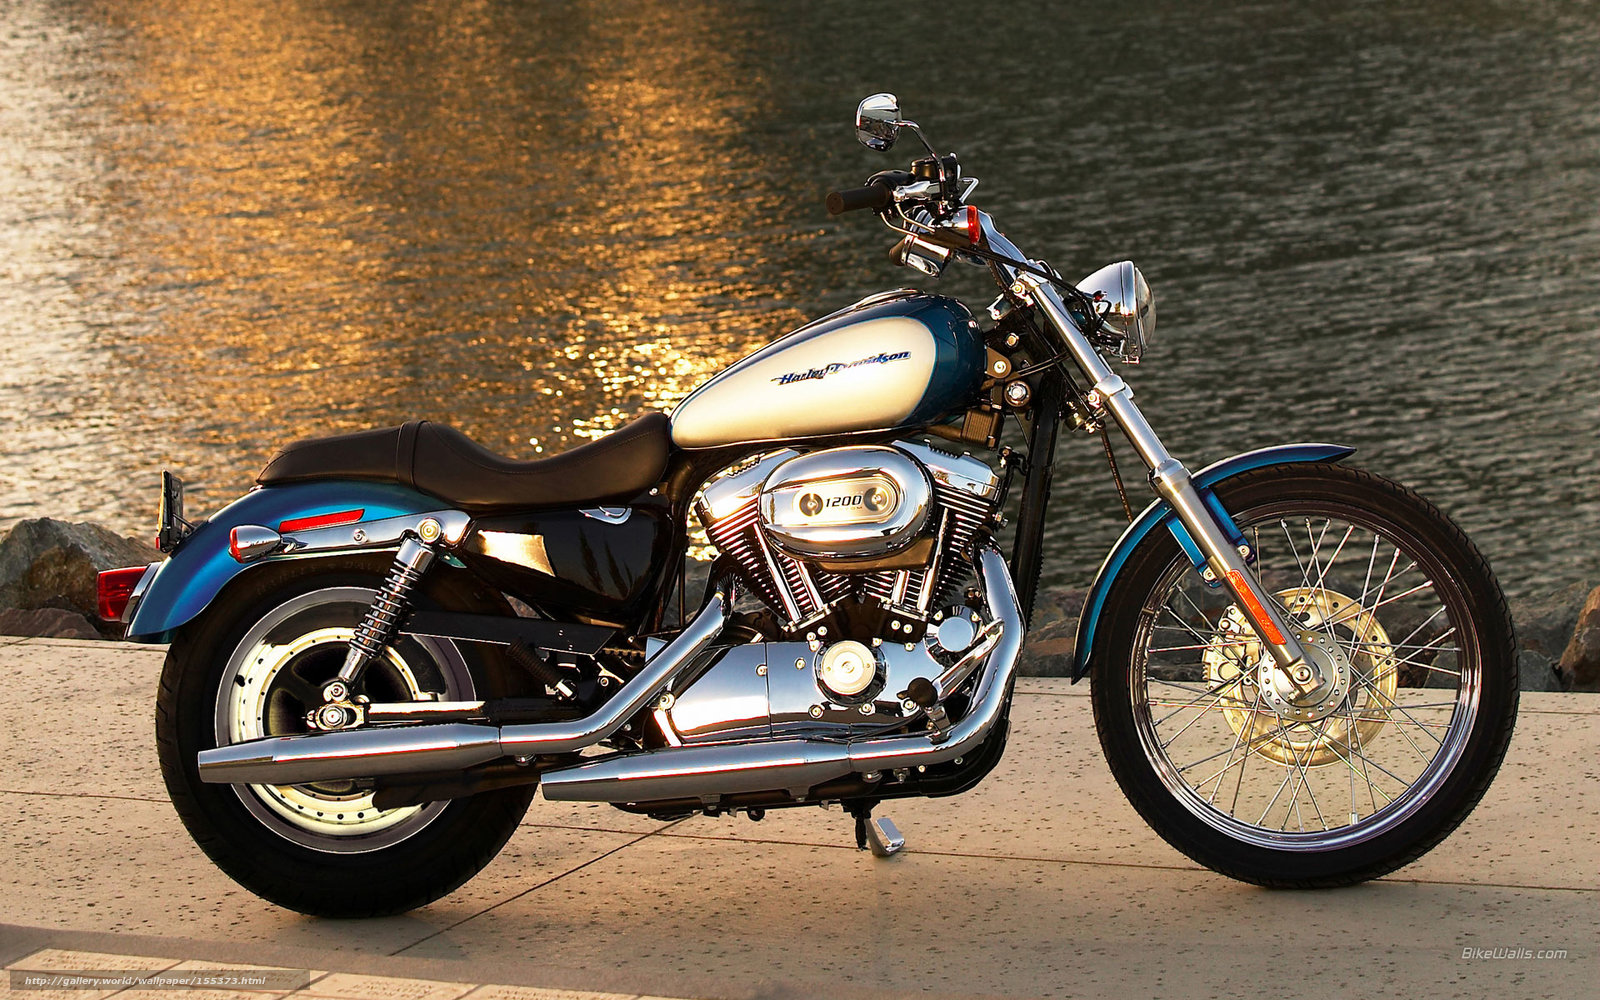 Download wallpaper Harley Davidson Sportster XL 1200C 1600x1000